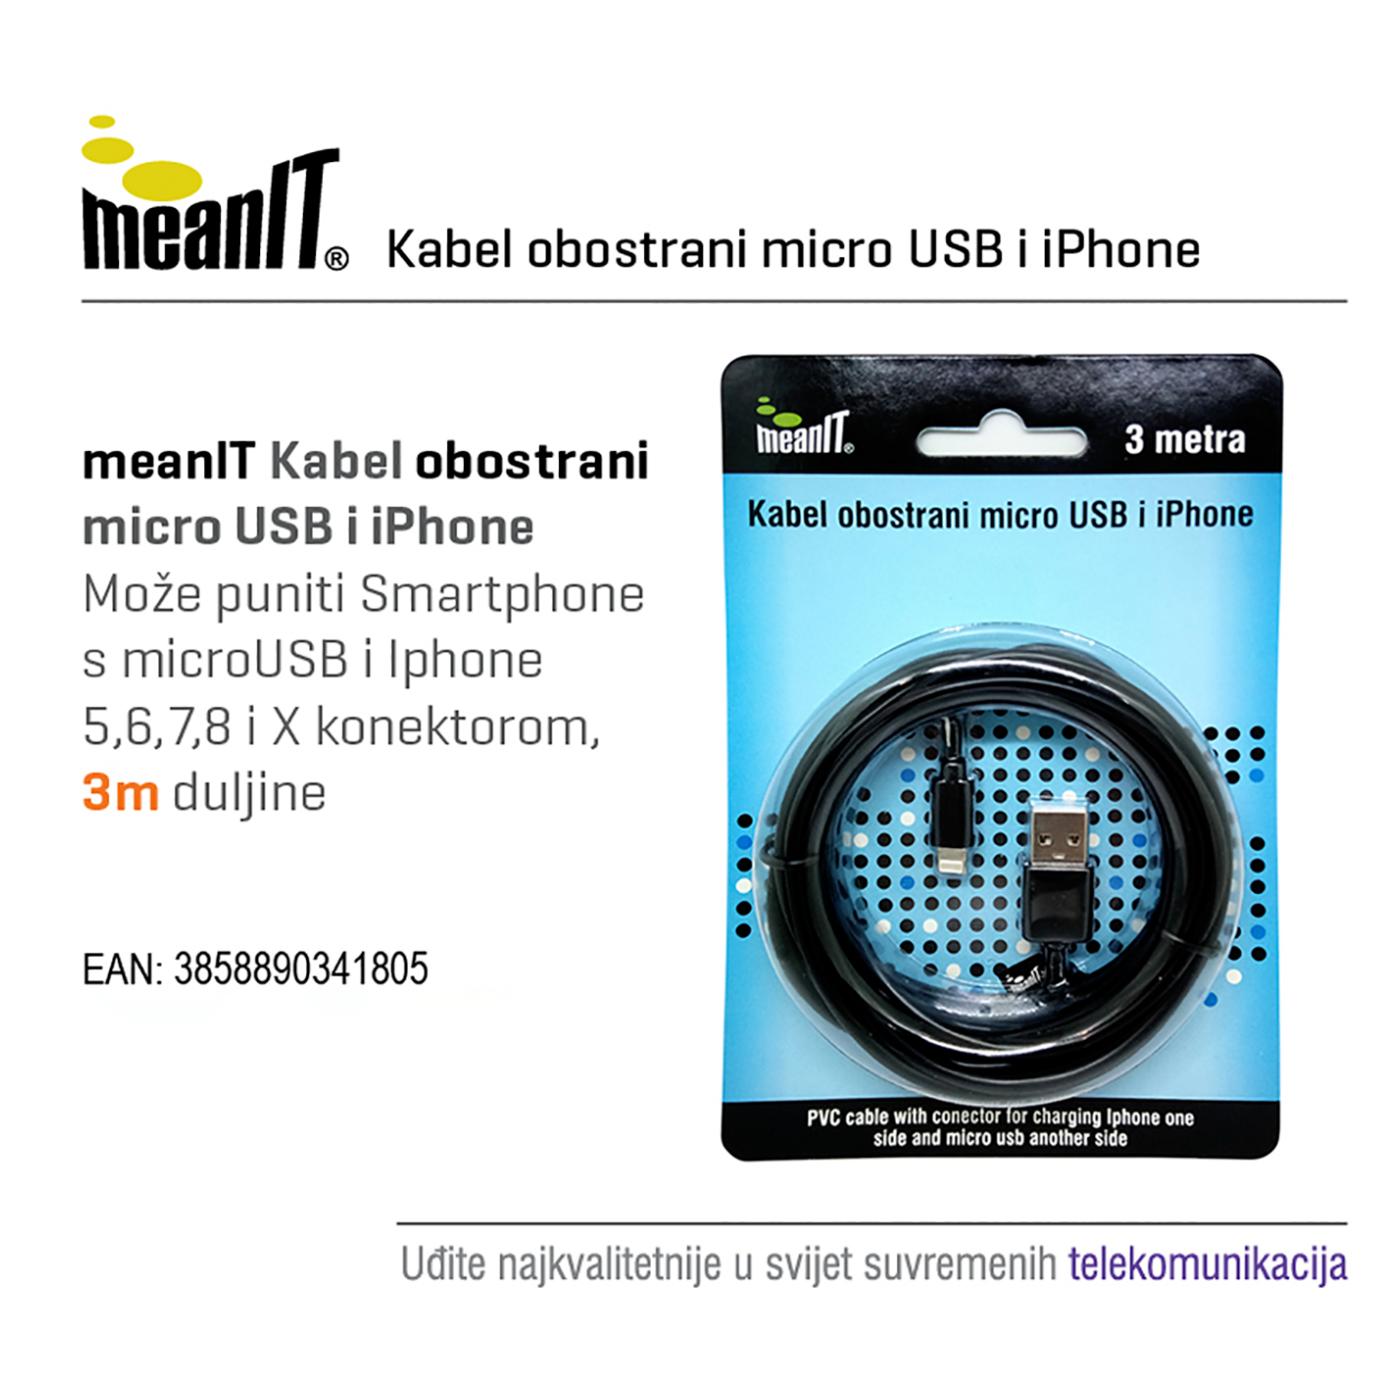 KABEL MICROUSB / iPHONE